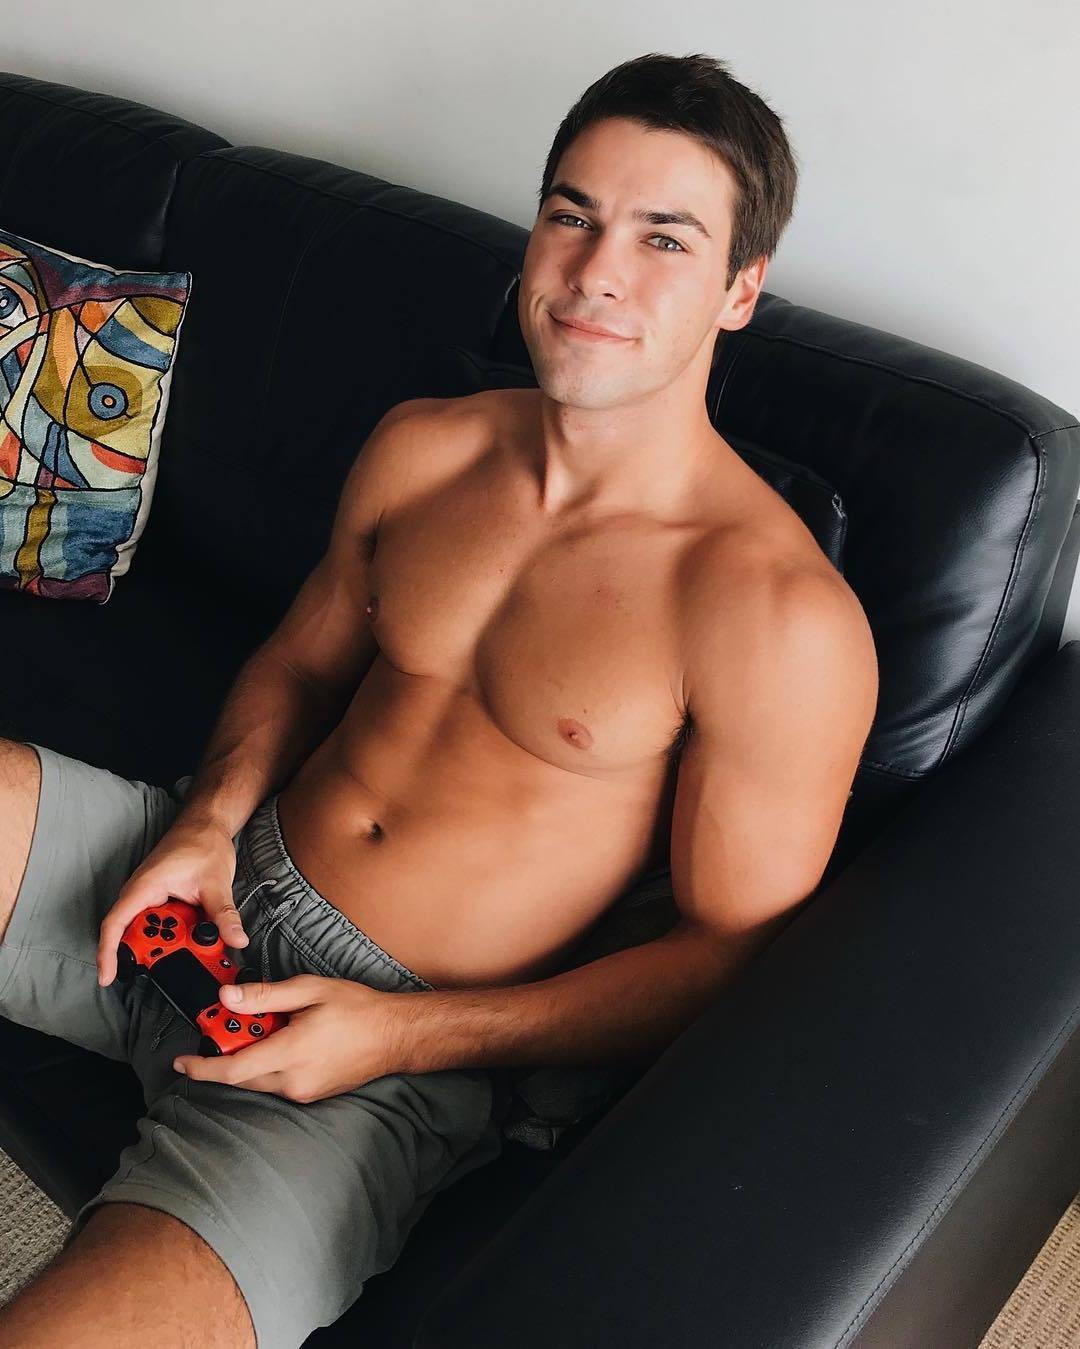 handsome-young-barechest-boy-next-door-addicted-cute-boyfriend-home-gamer